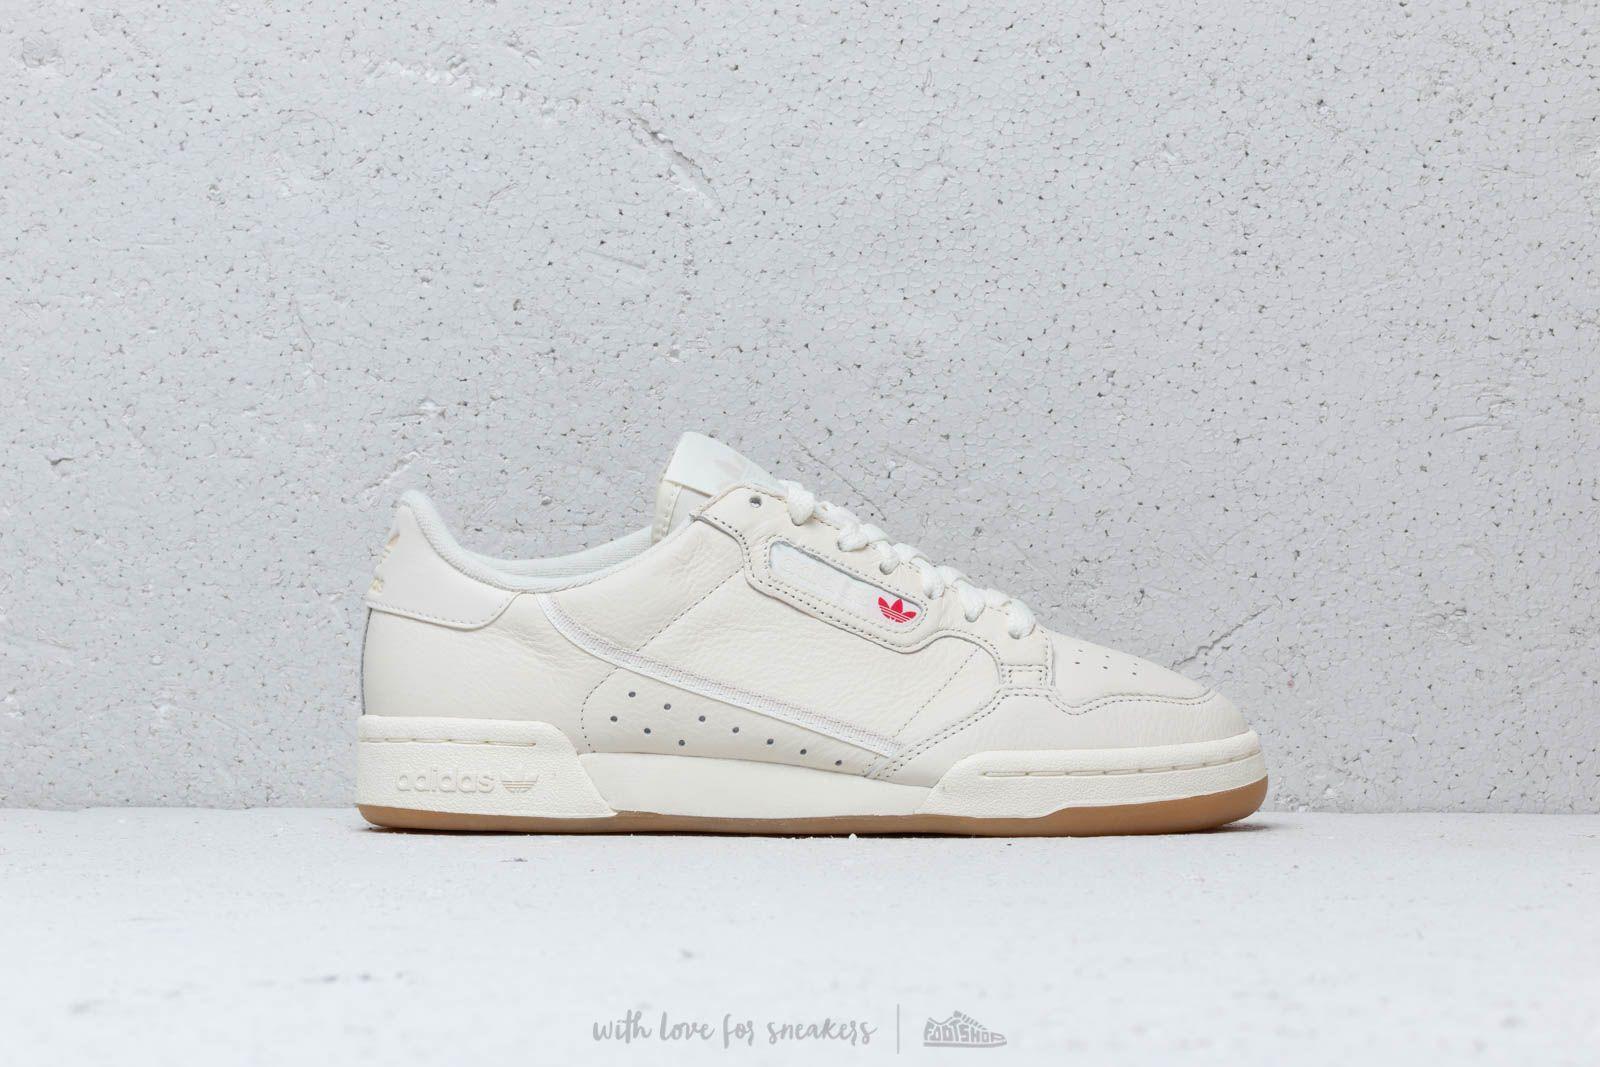 adidas Continental 80Off White/ Raw White/ Gum